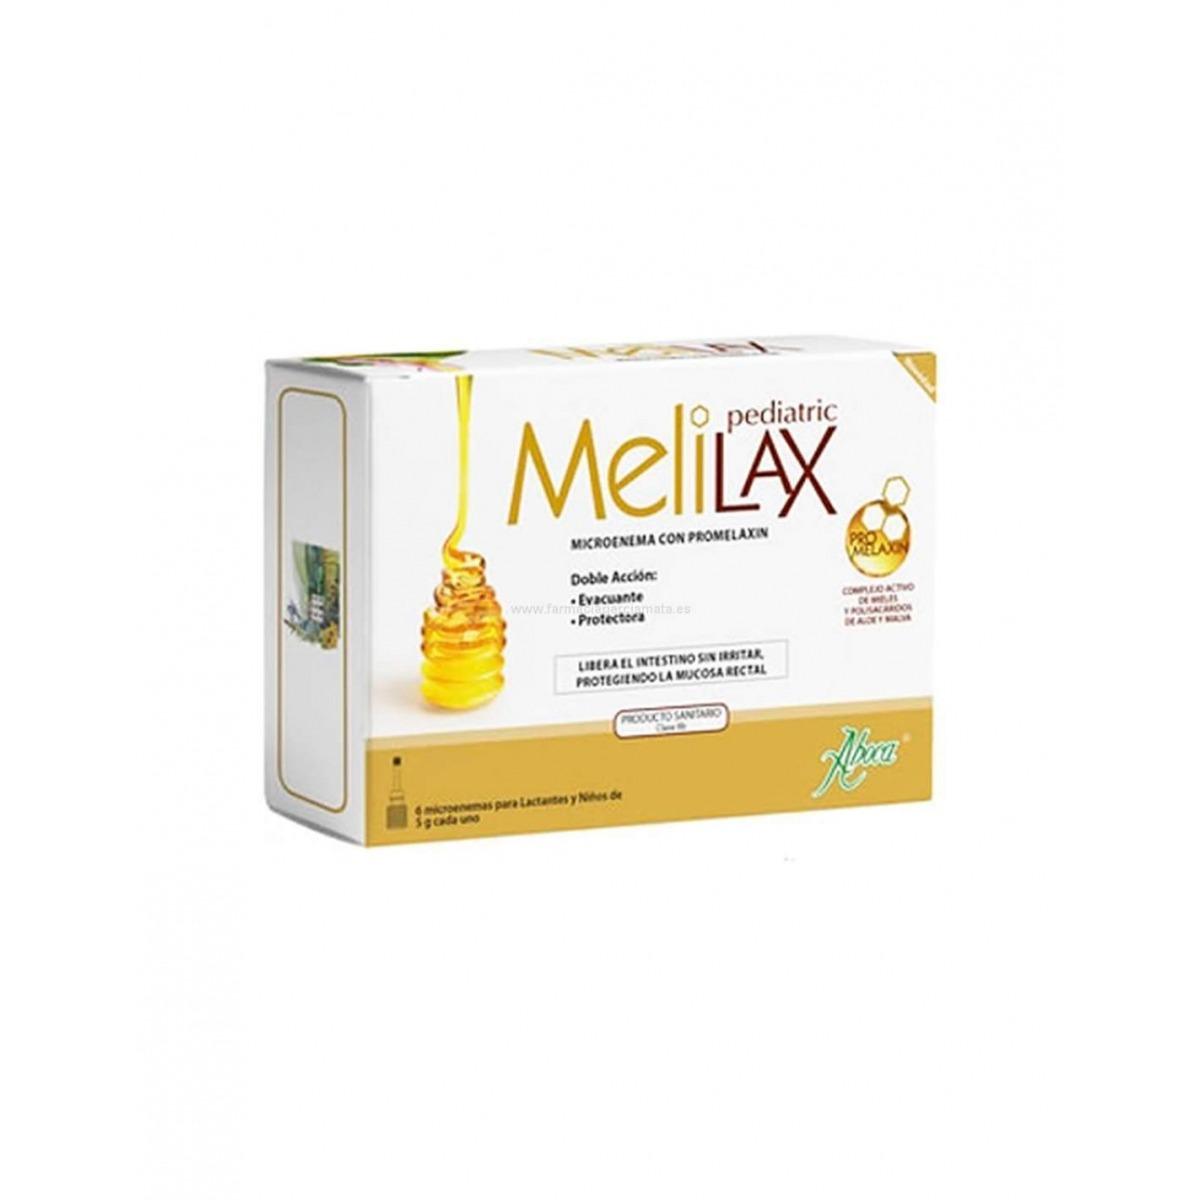 MELILAXPEDIATRICMICROENEMAS5G6UNIDADES I1